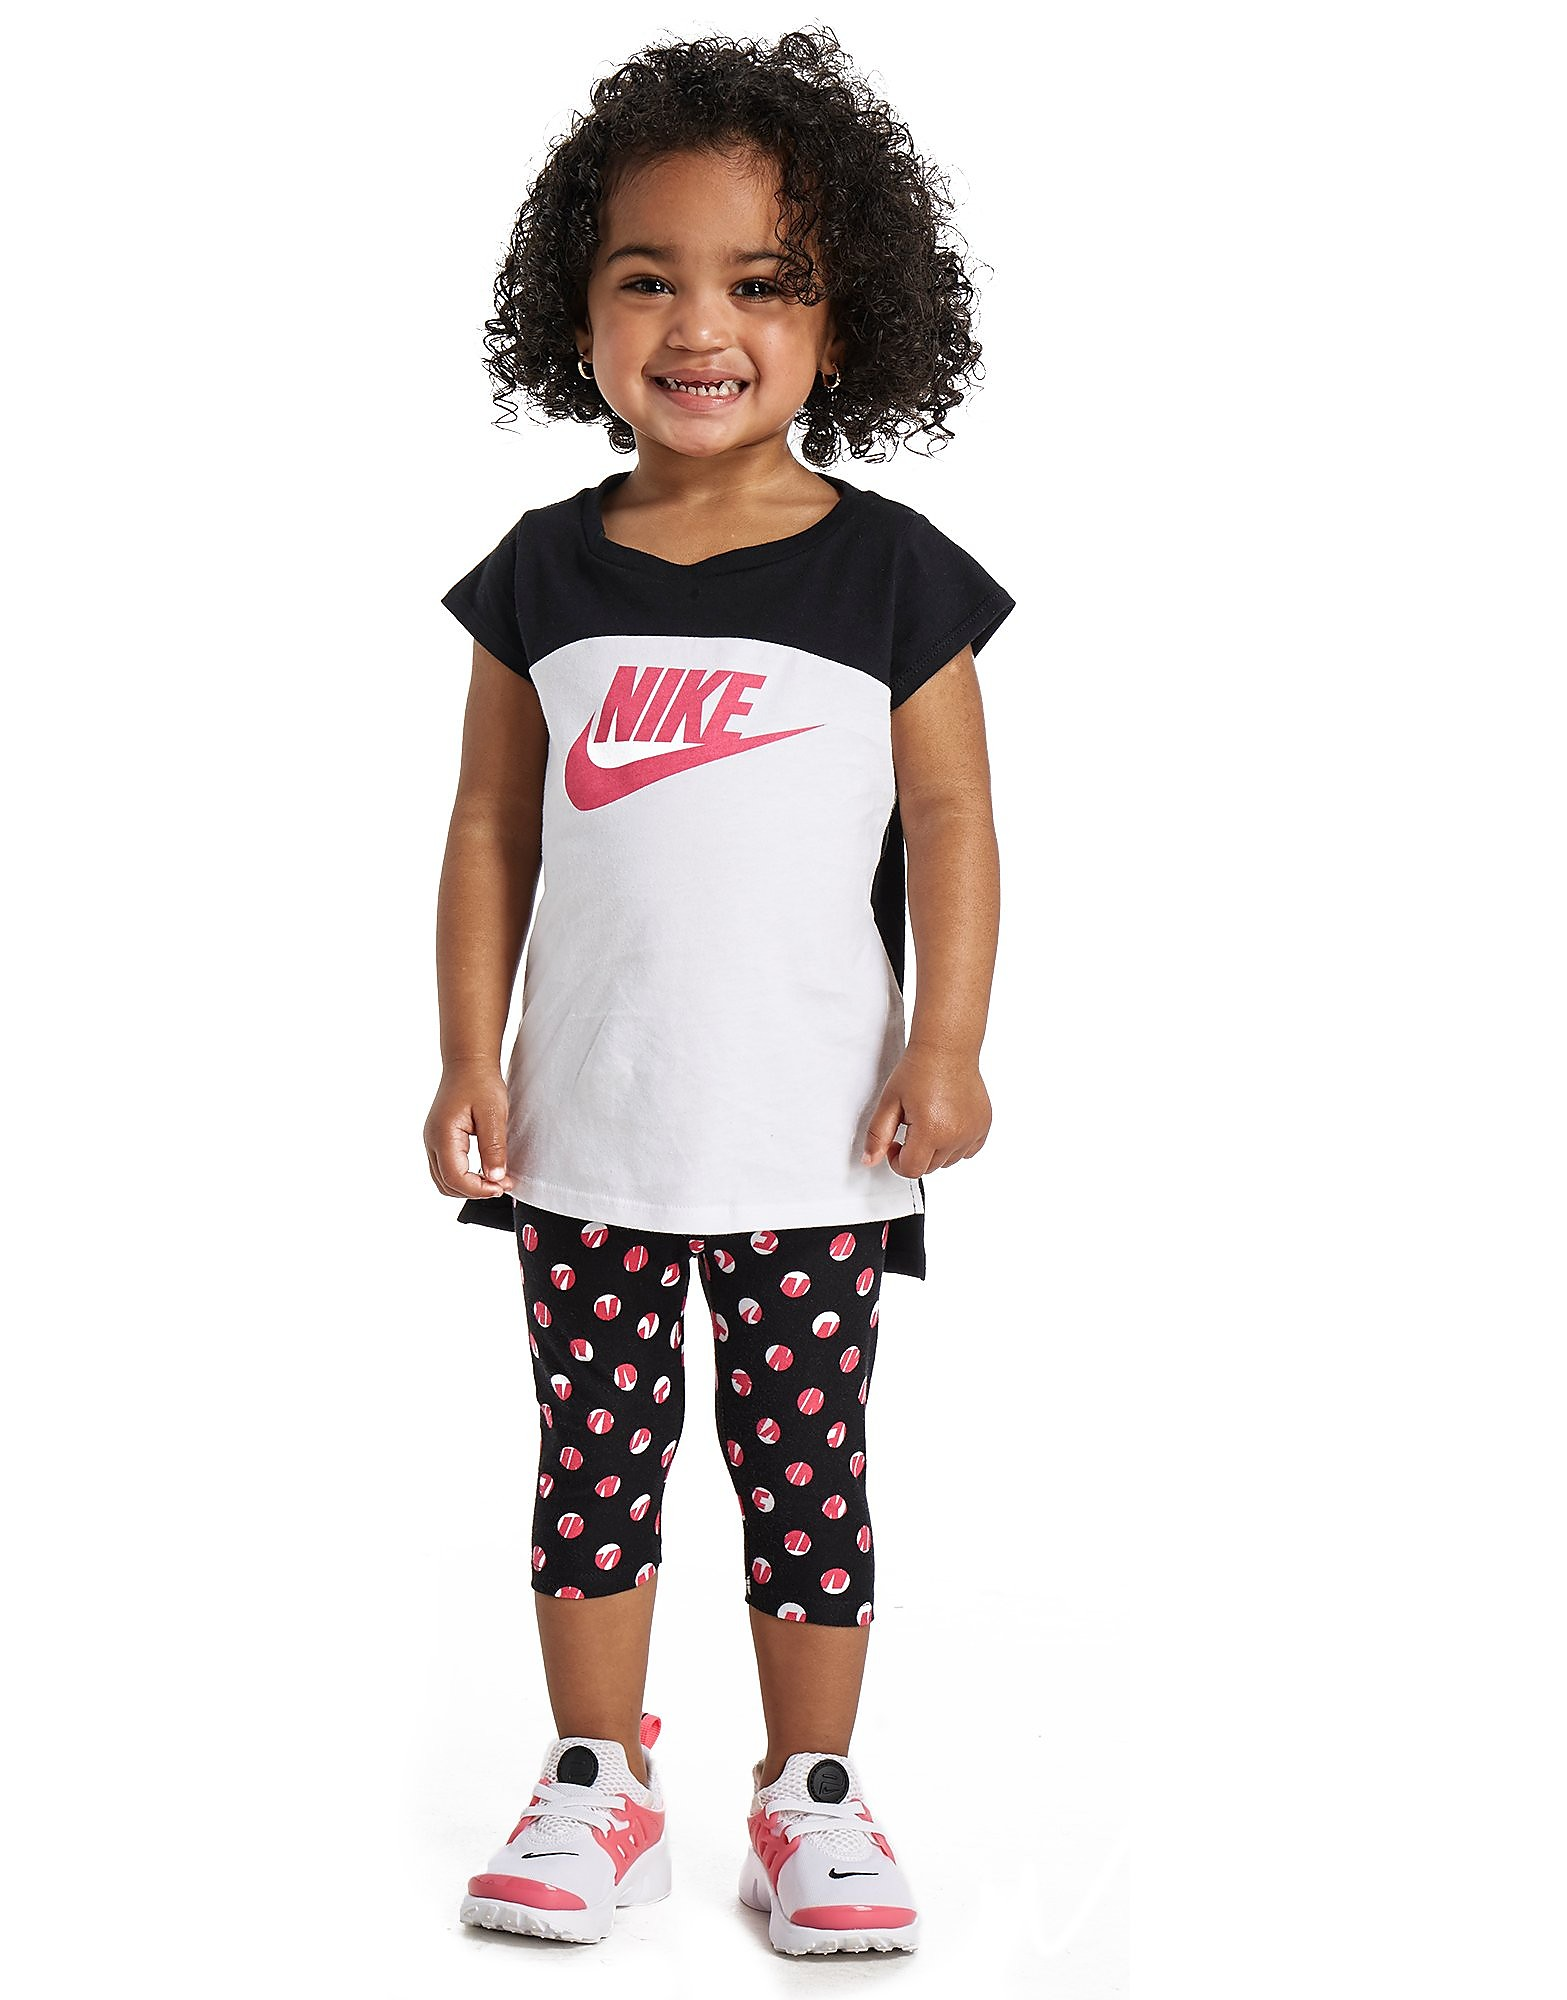 Nike Girls' T-Shirt and Leggings Set Infants